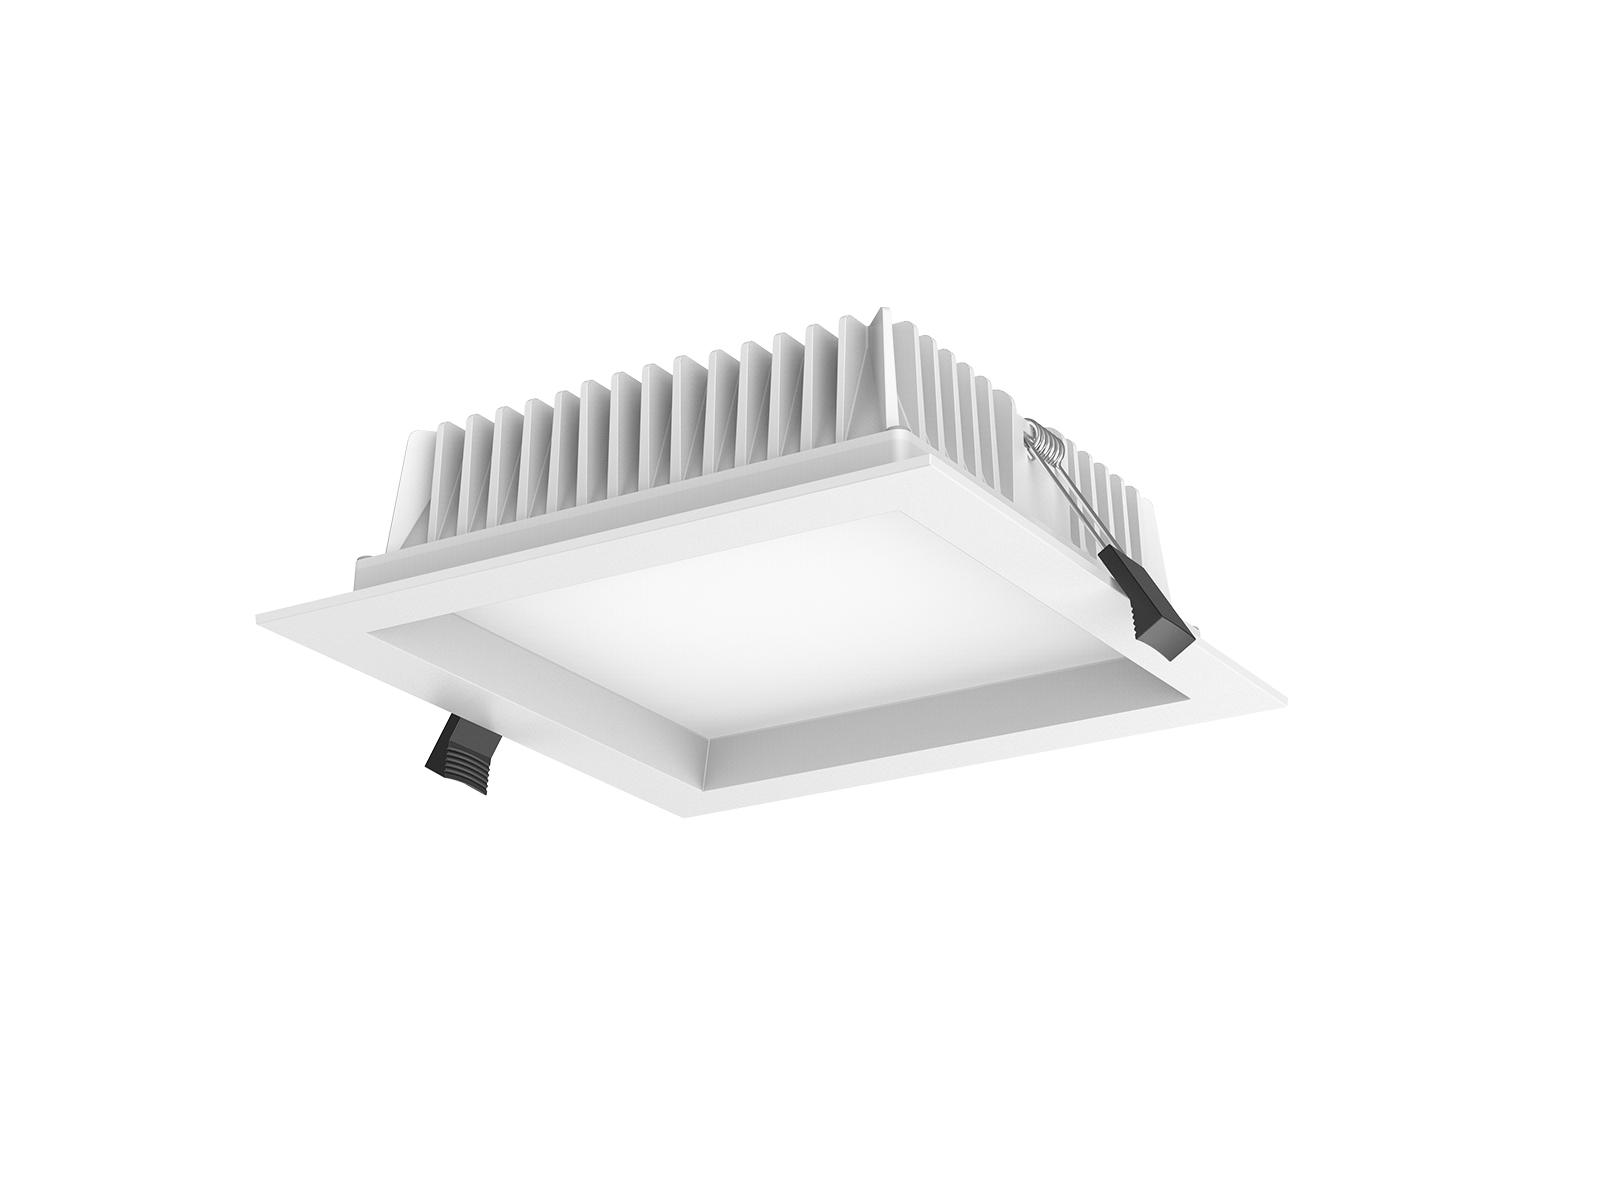 6 Inch 100mm Led Downlight Upshine Lighting 0 10v Dimming Wiring Diagram